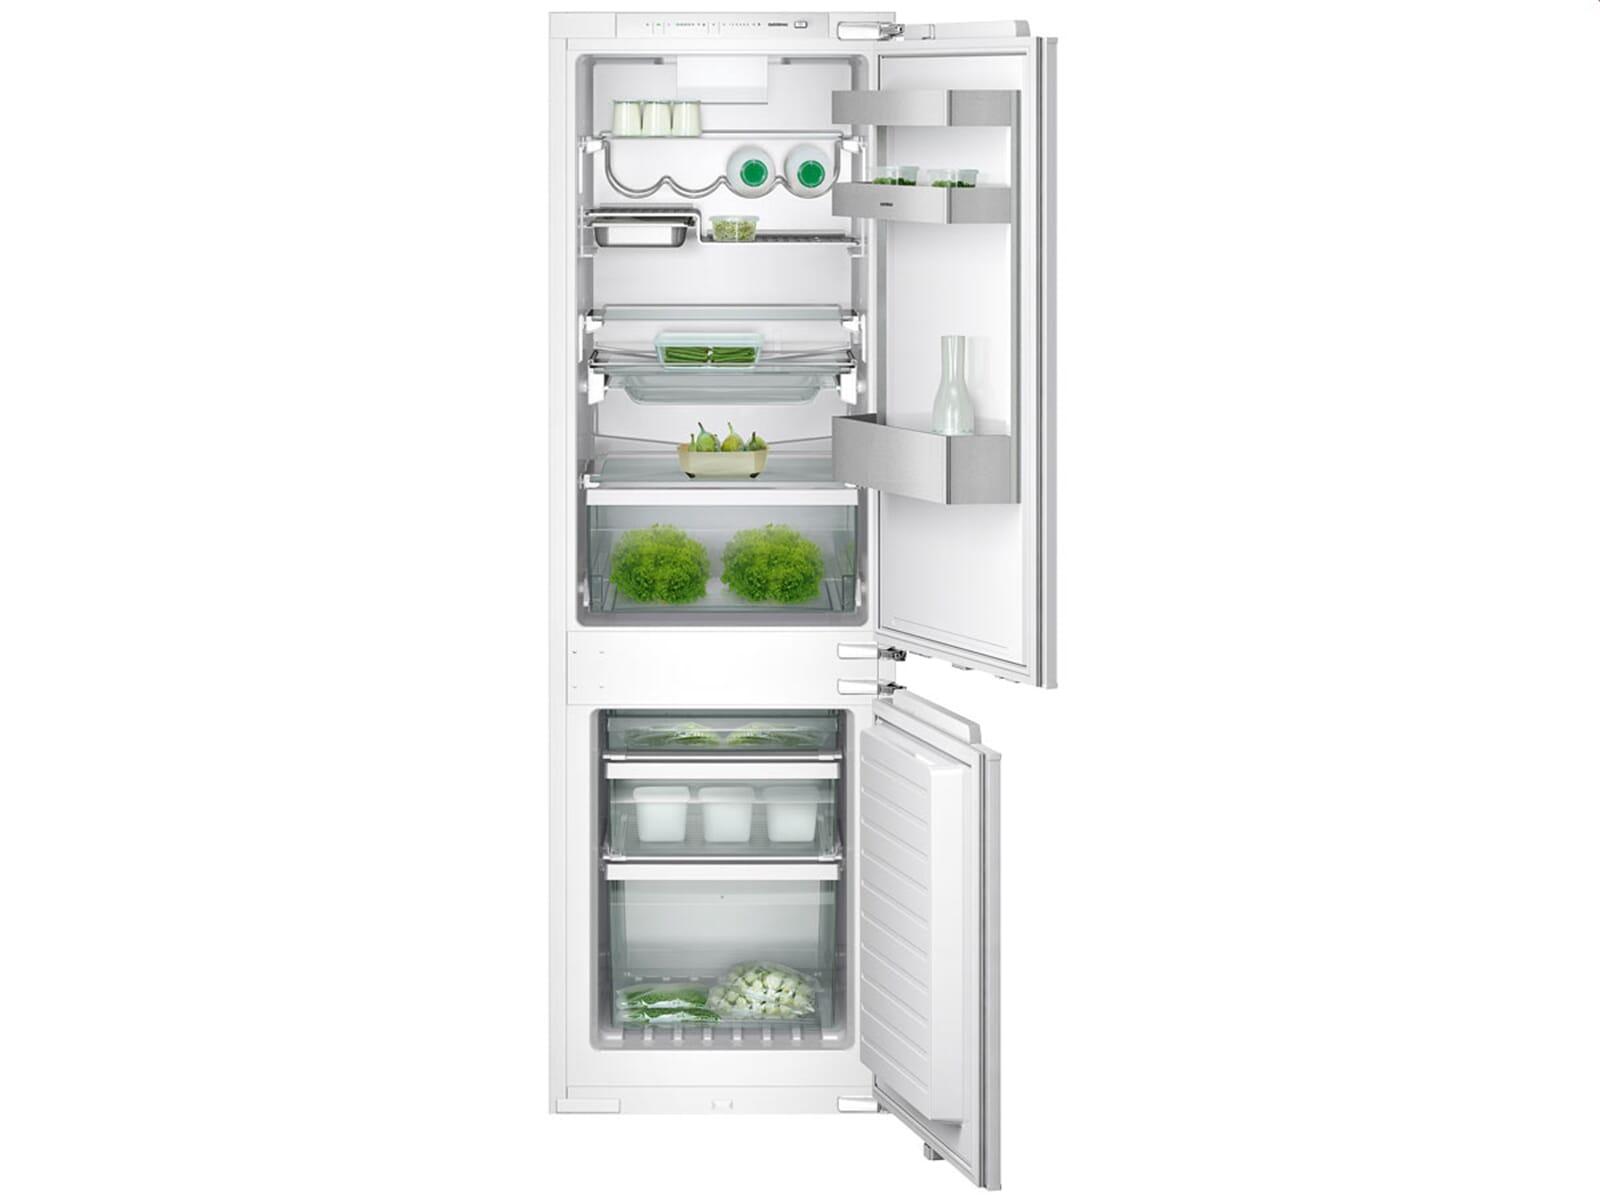 Gorenje Kühlschrank Lila : Gorenje kühlschrank lila: gorenje kühlschrank retro gorenje rk oc l